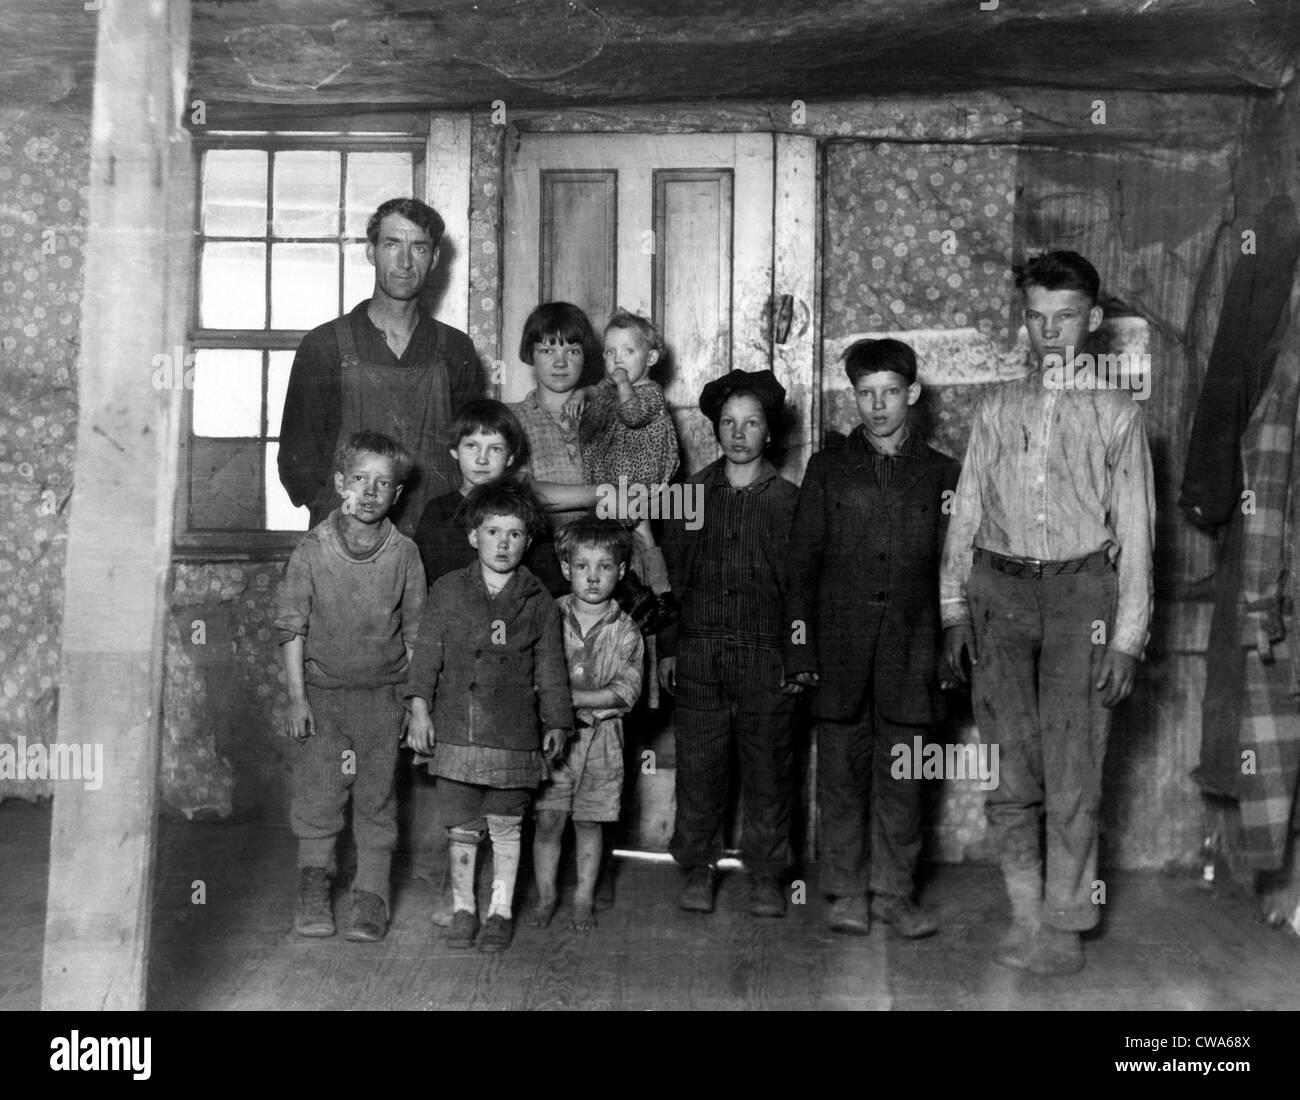 coal-mining-family-circa-1920s-csu-archi